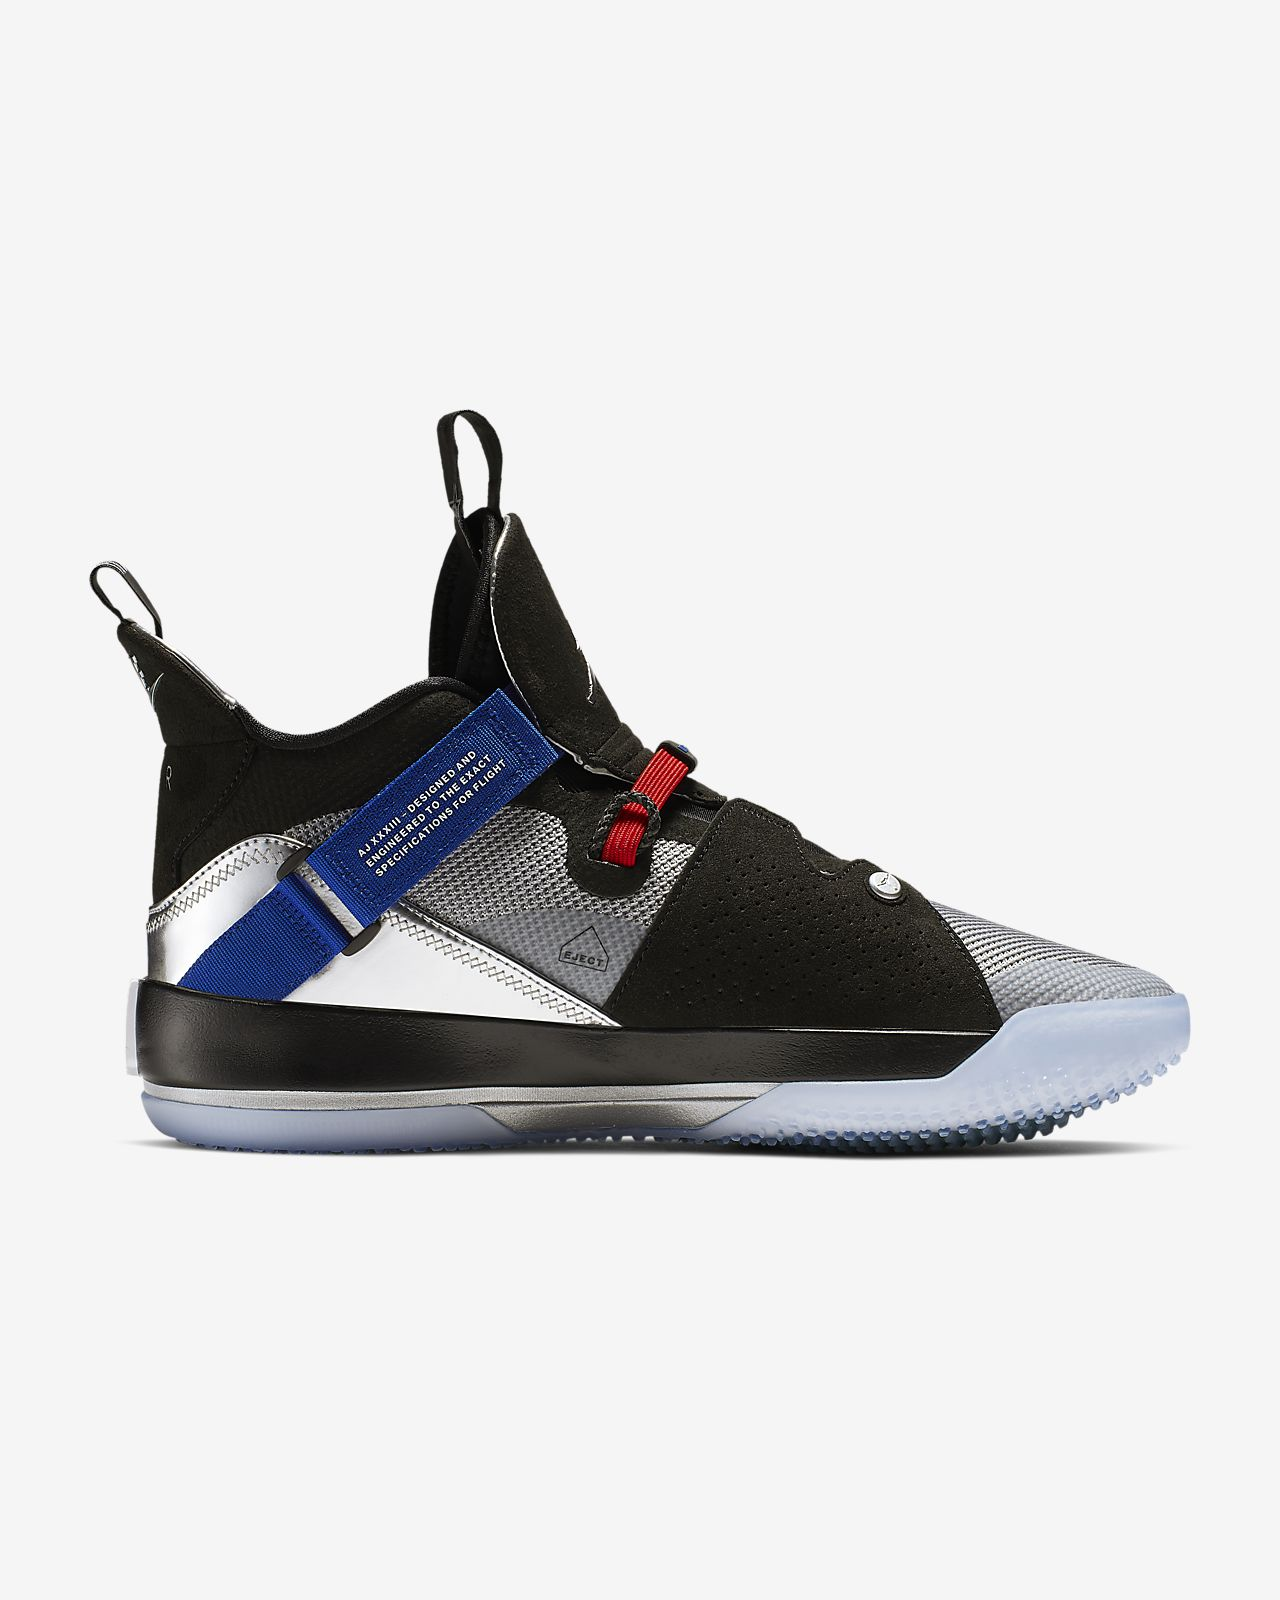 sports shoes b0f85 69993 Low Resolution Air Jordan XXXIII Basketball Shoe Air Jordan XXXIII Basketball  Shoe